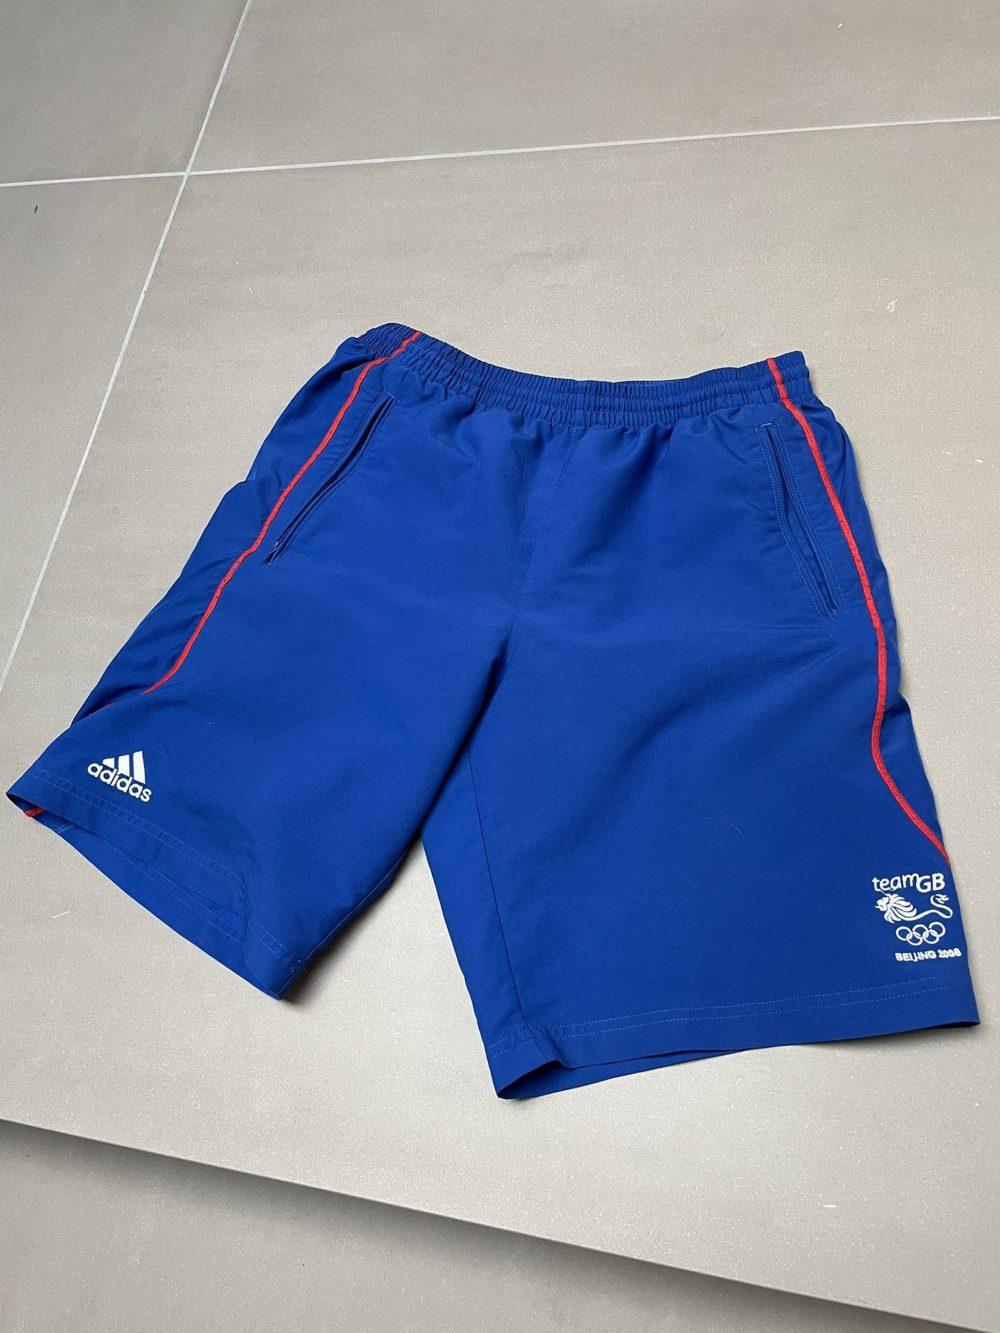 Chris Hoy's 2008 Beijing Olympic shorts | Scottish News